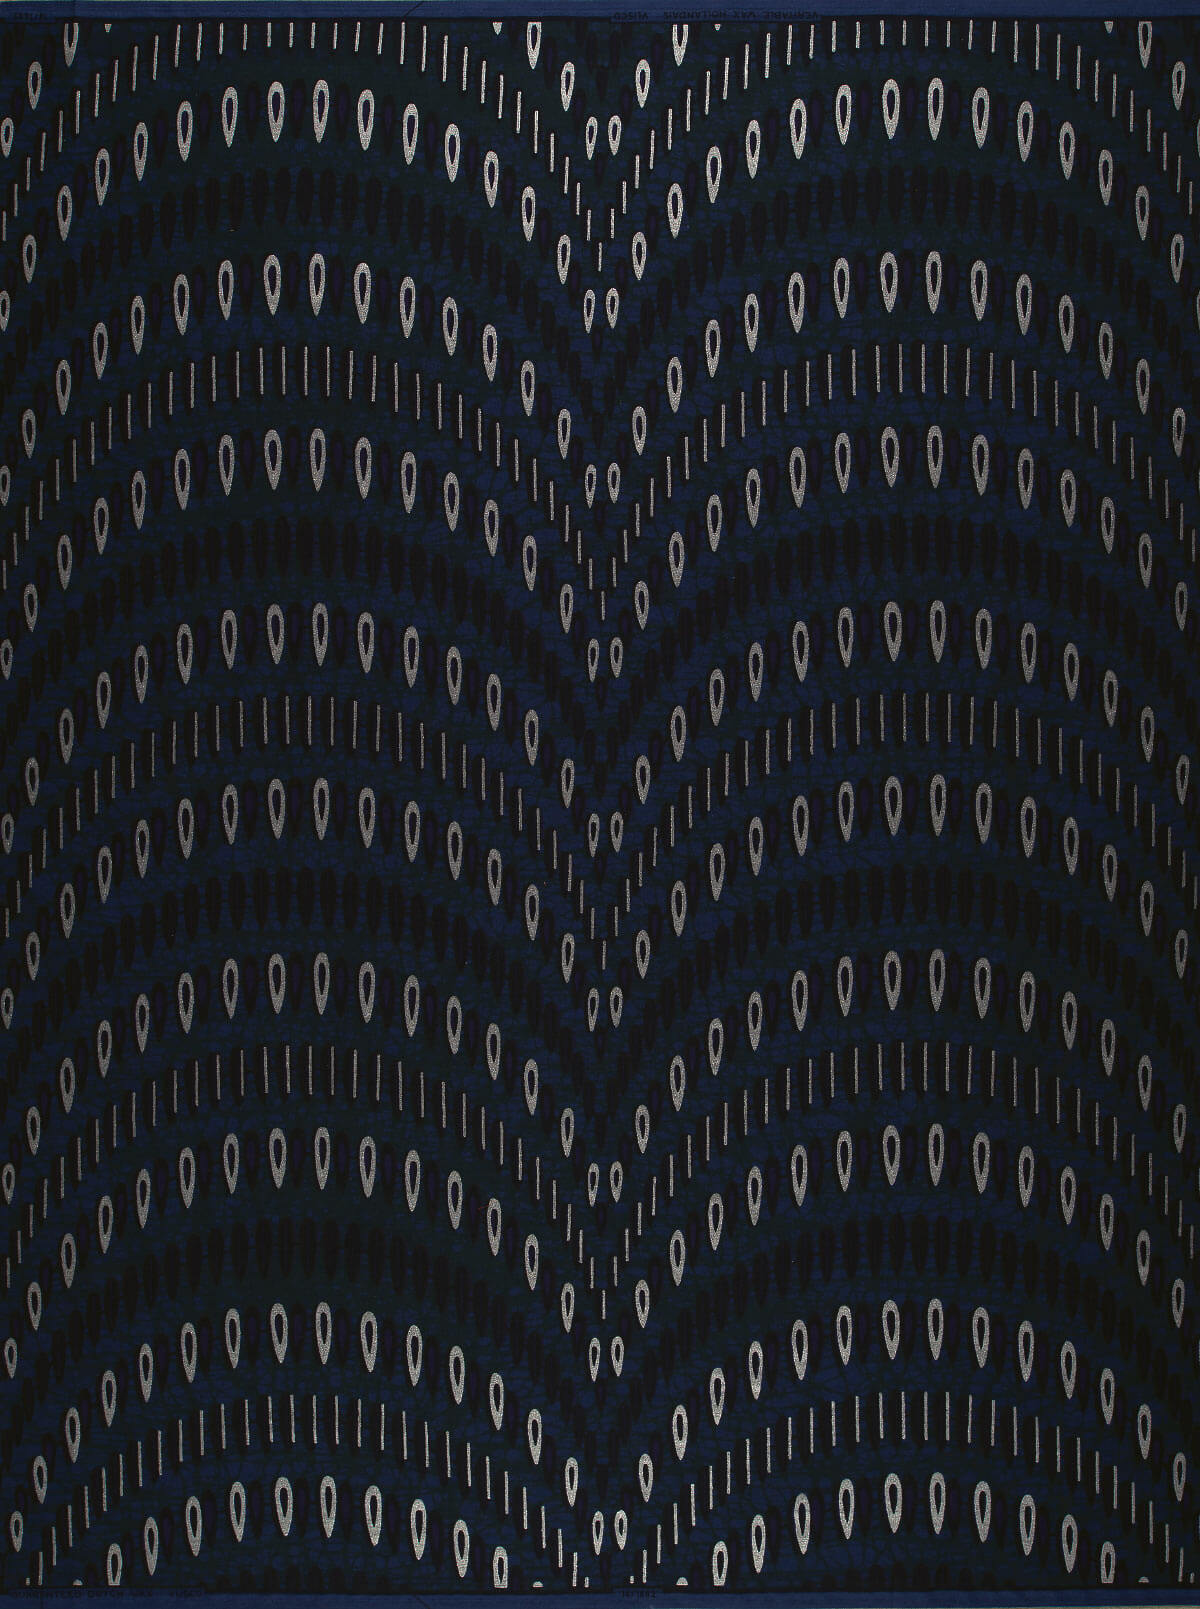 VL01682.106